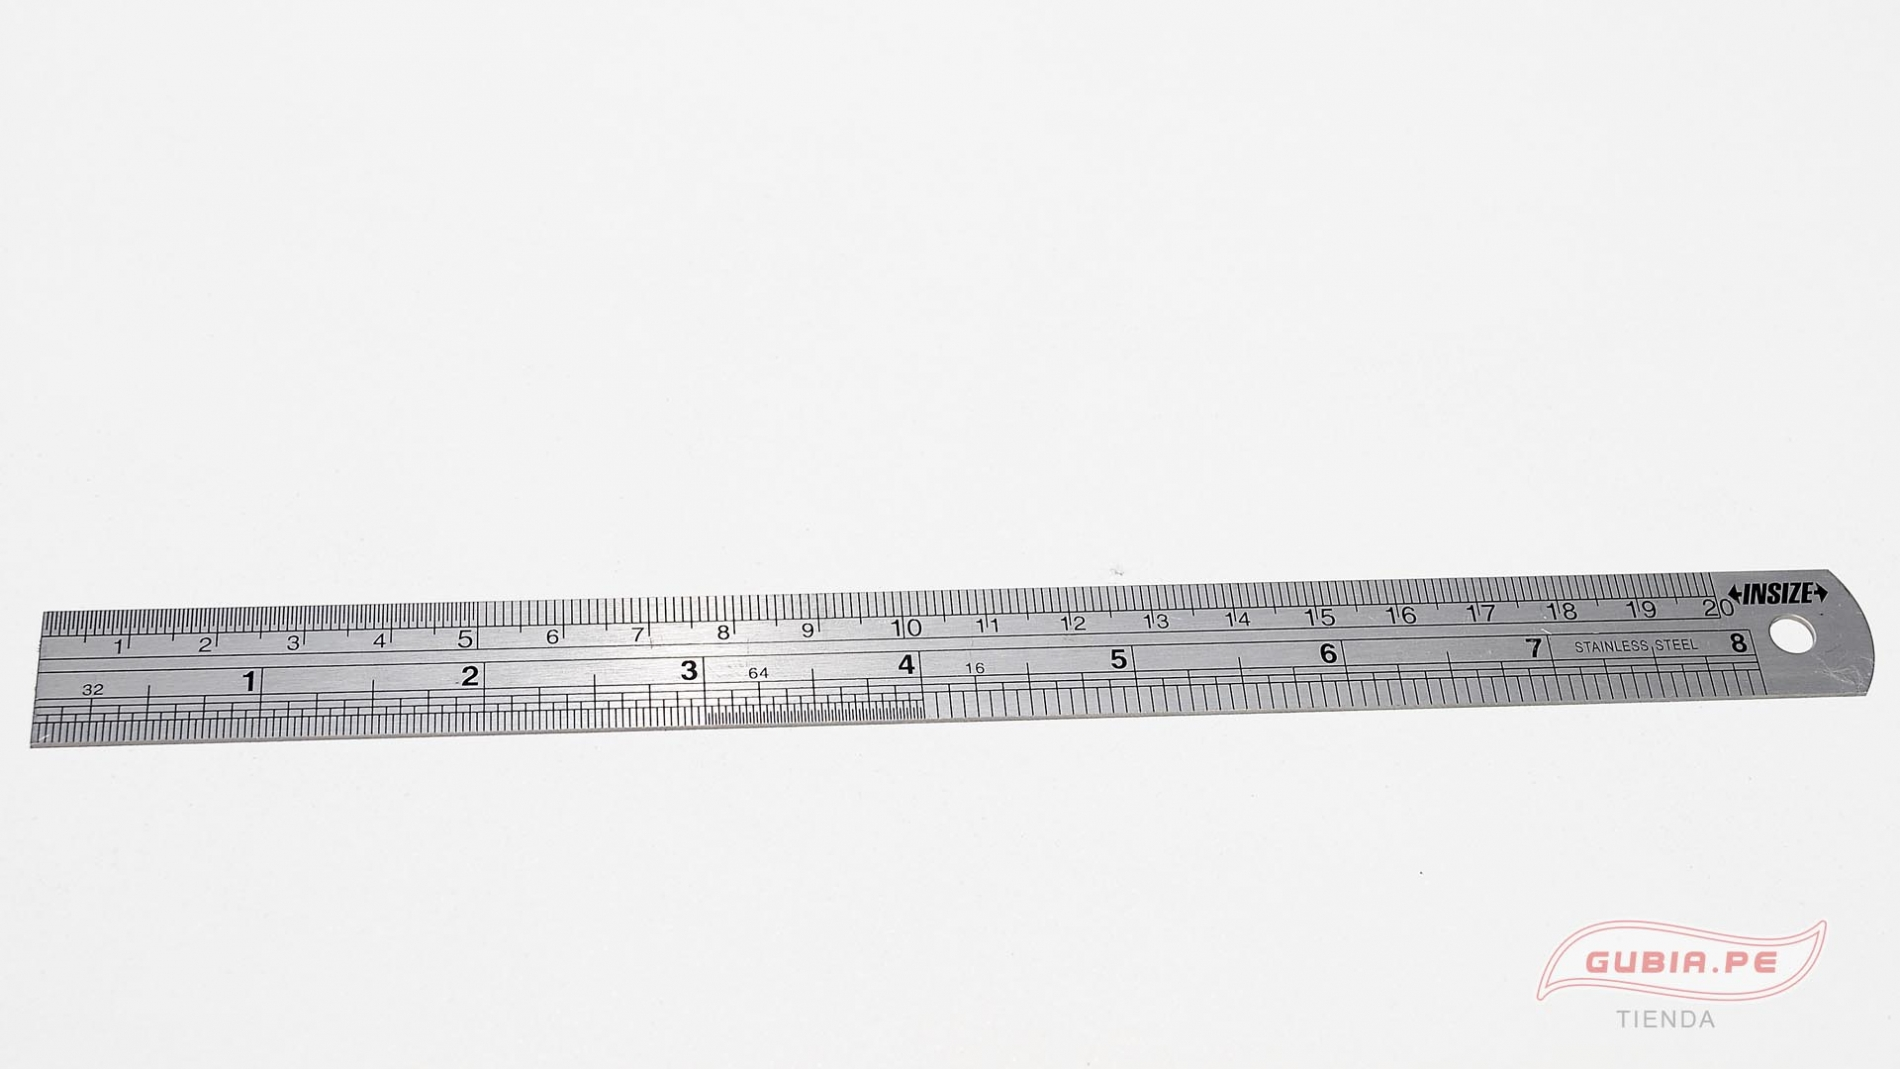 7110-200-Regla inoxidable 200mm Insize 7110-200-max-2.